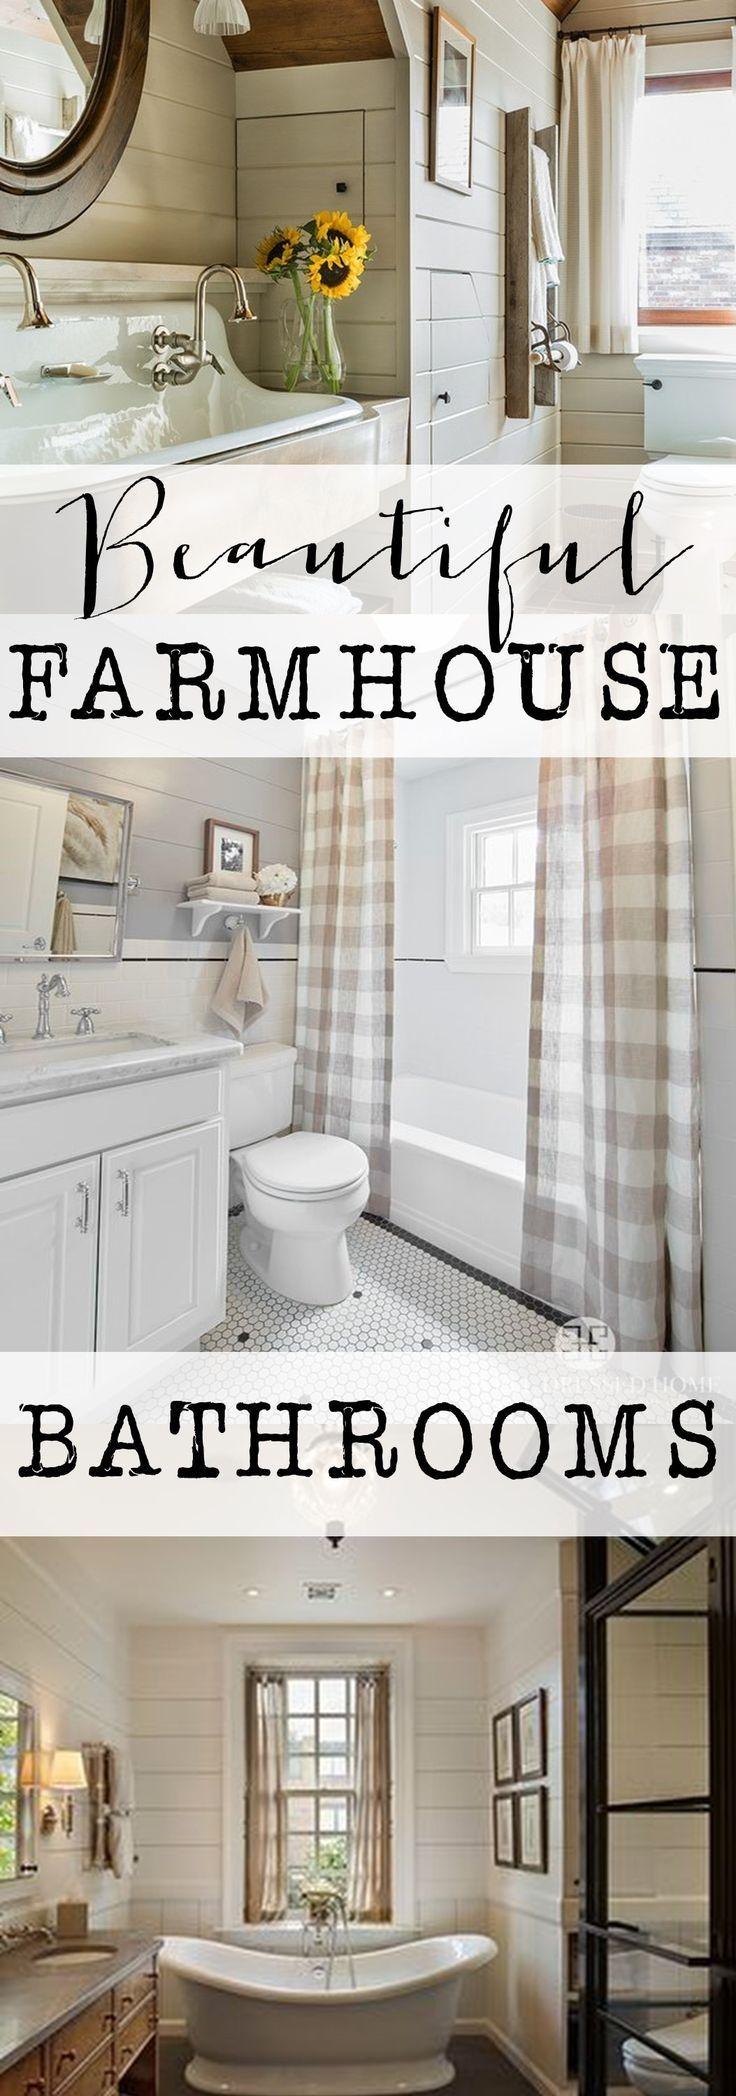 If You Love Farmhouse Shiplap Vintage Farm Sinks Tile Texture